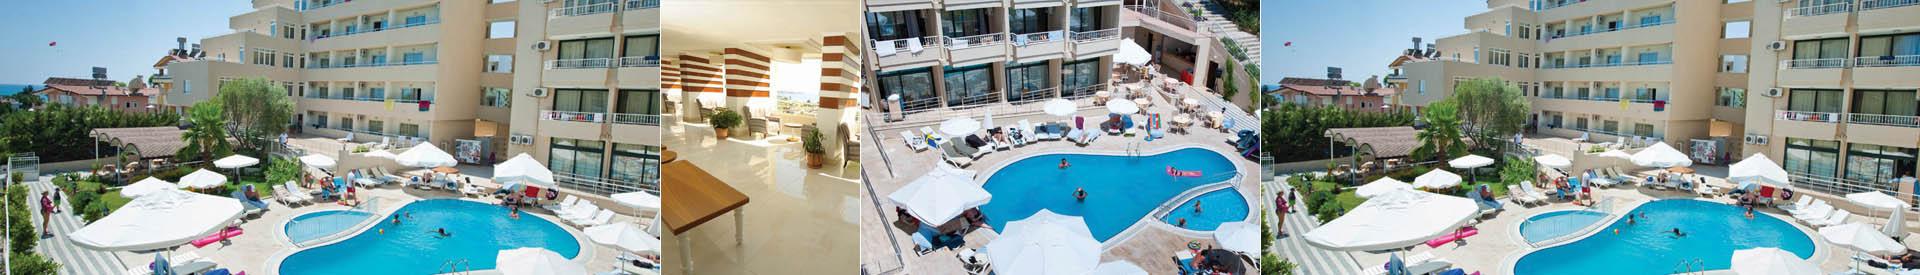 https://cestovnakancelariadaka.sk/files/product/sweet-park-hotel-turecko_top.jpg